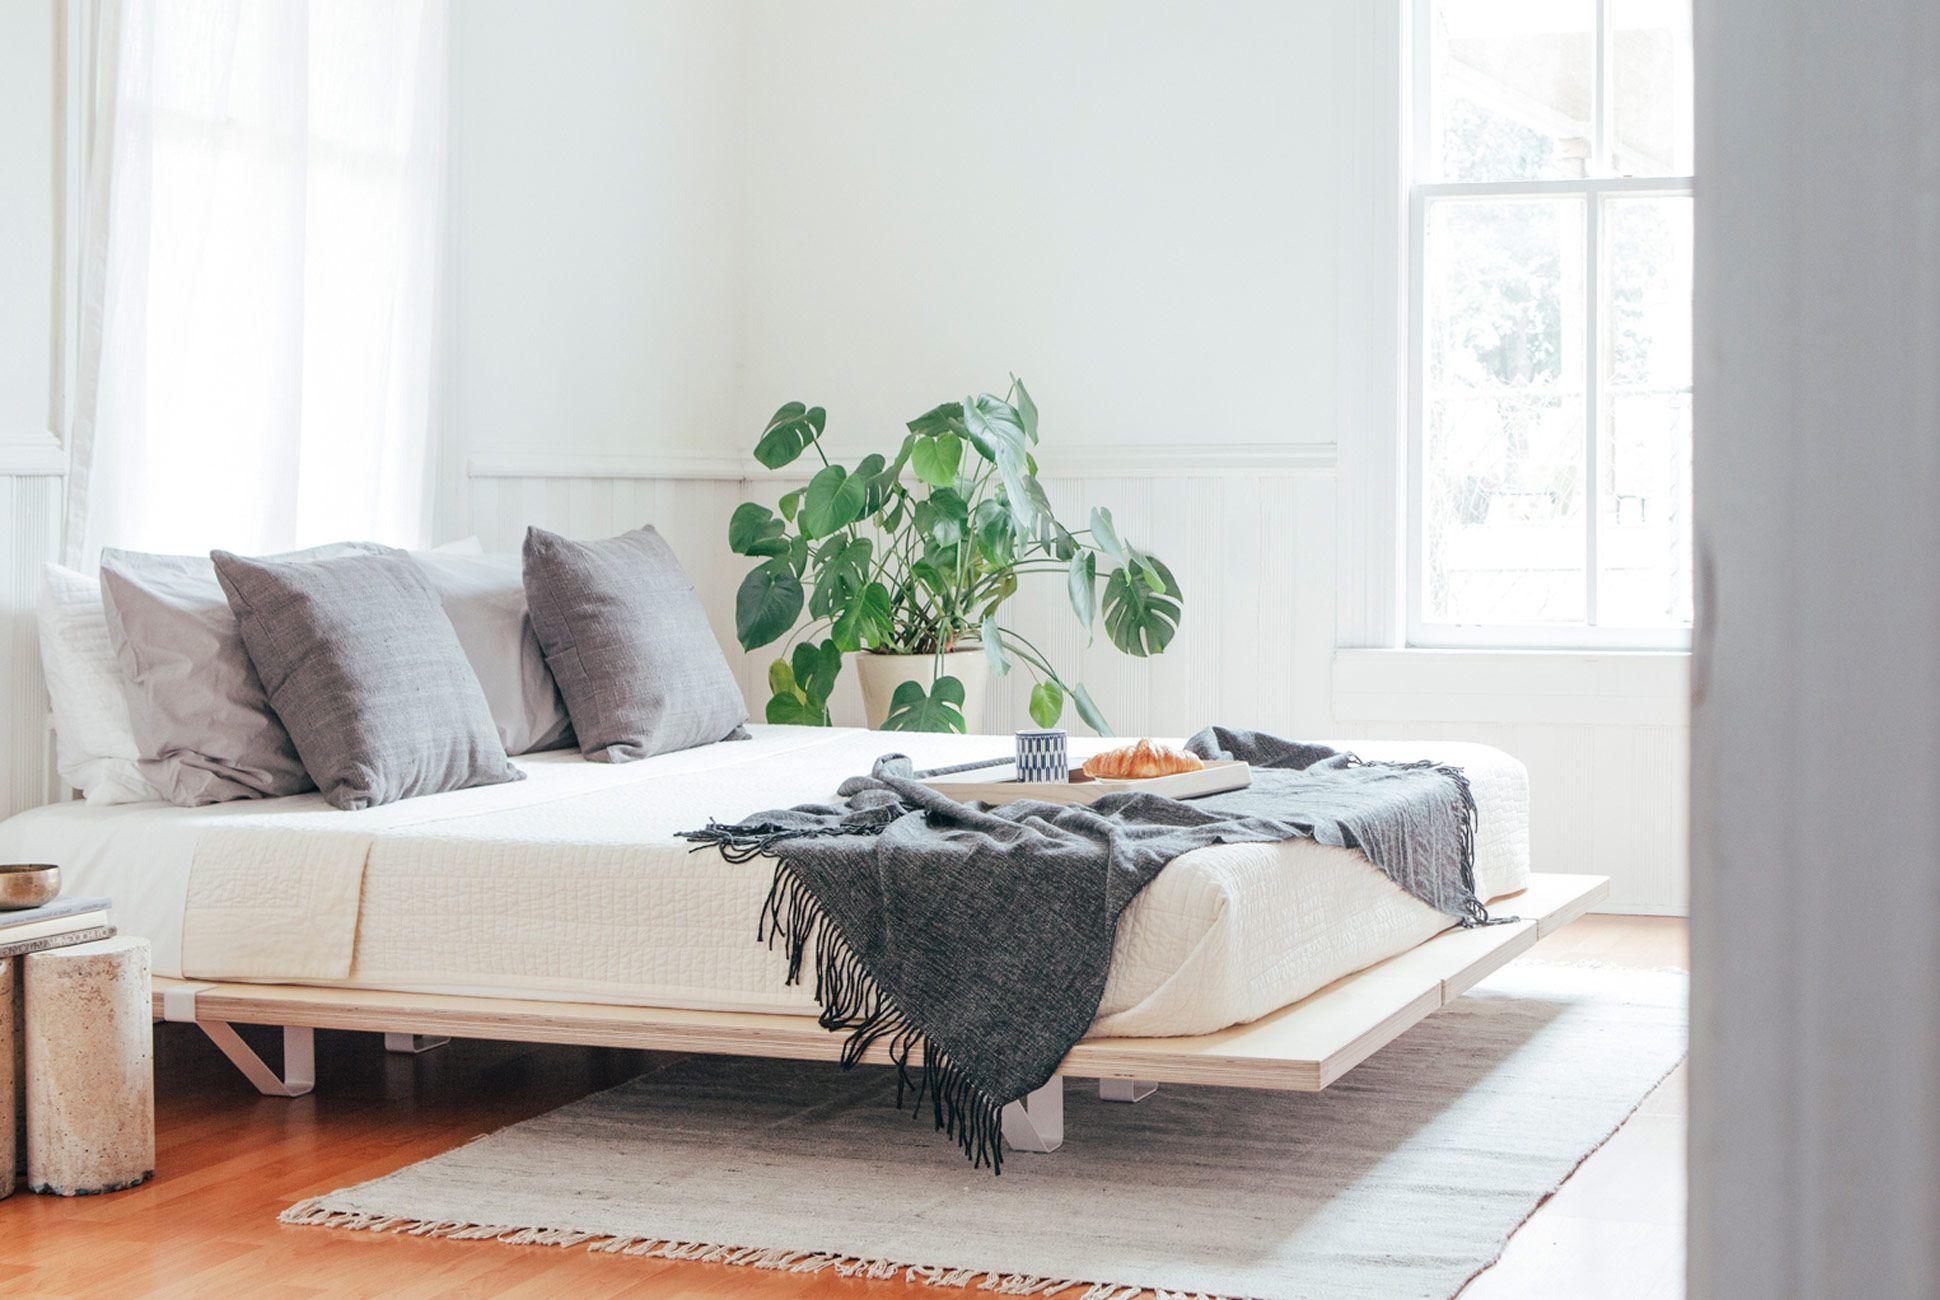 Super 3 Flat Pack Furniture Brands To Know Gear Patrol Machost Co Dining Chair Design Ideas Machostcouk